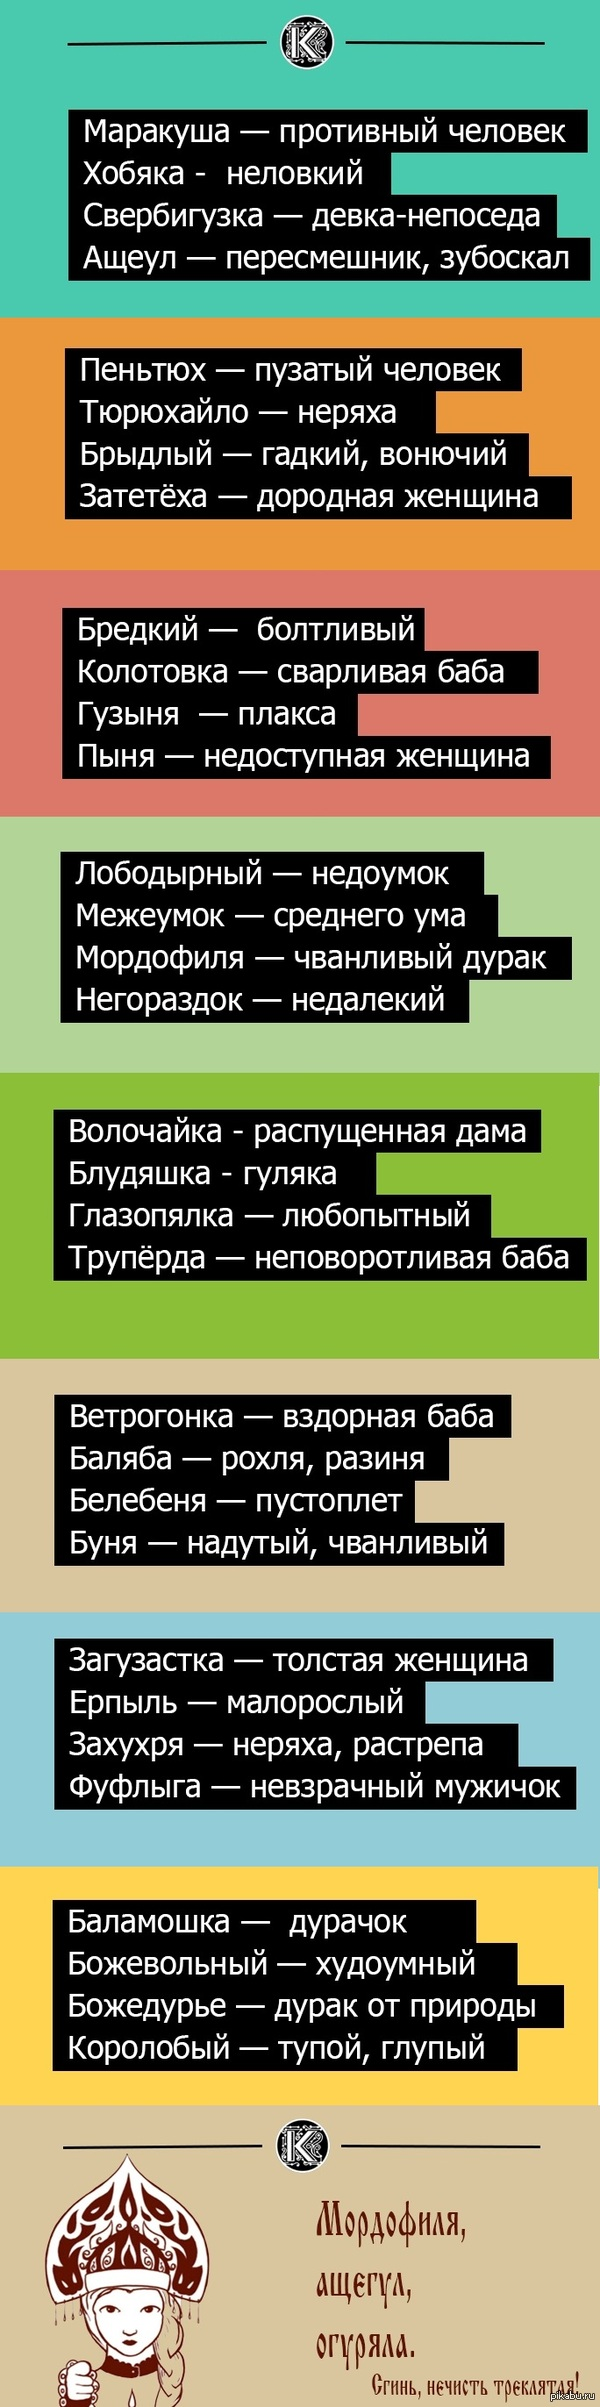 Русское, слово пизда фото